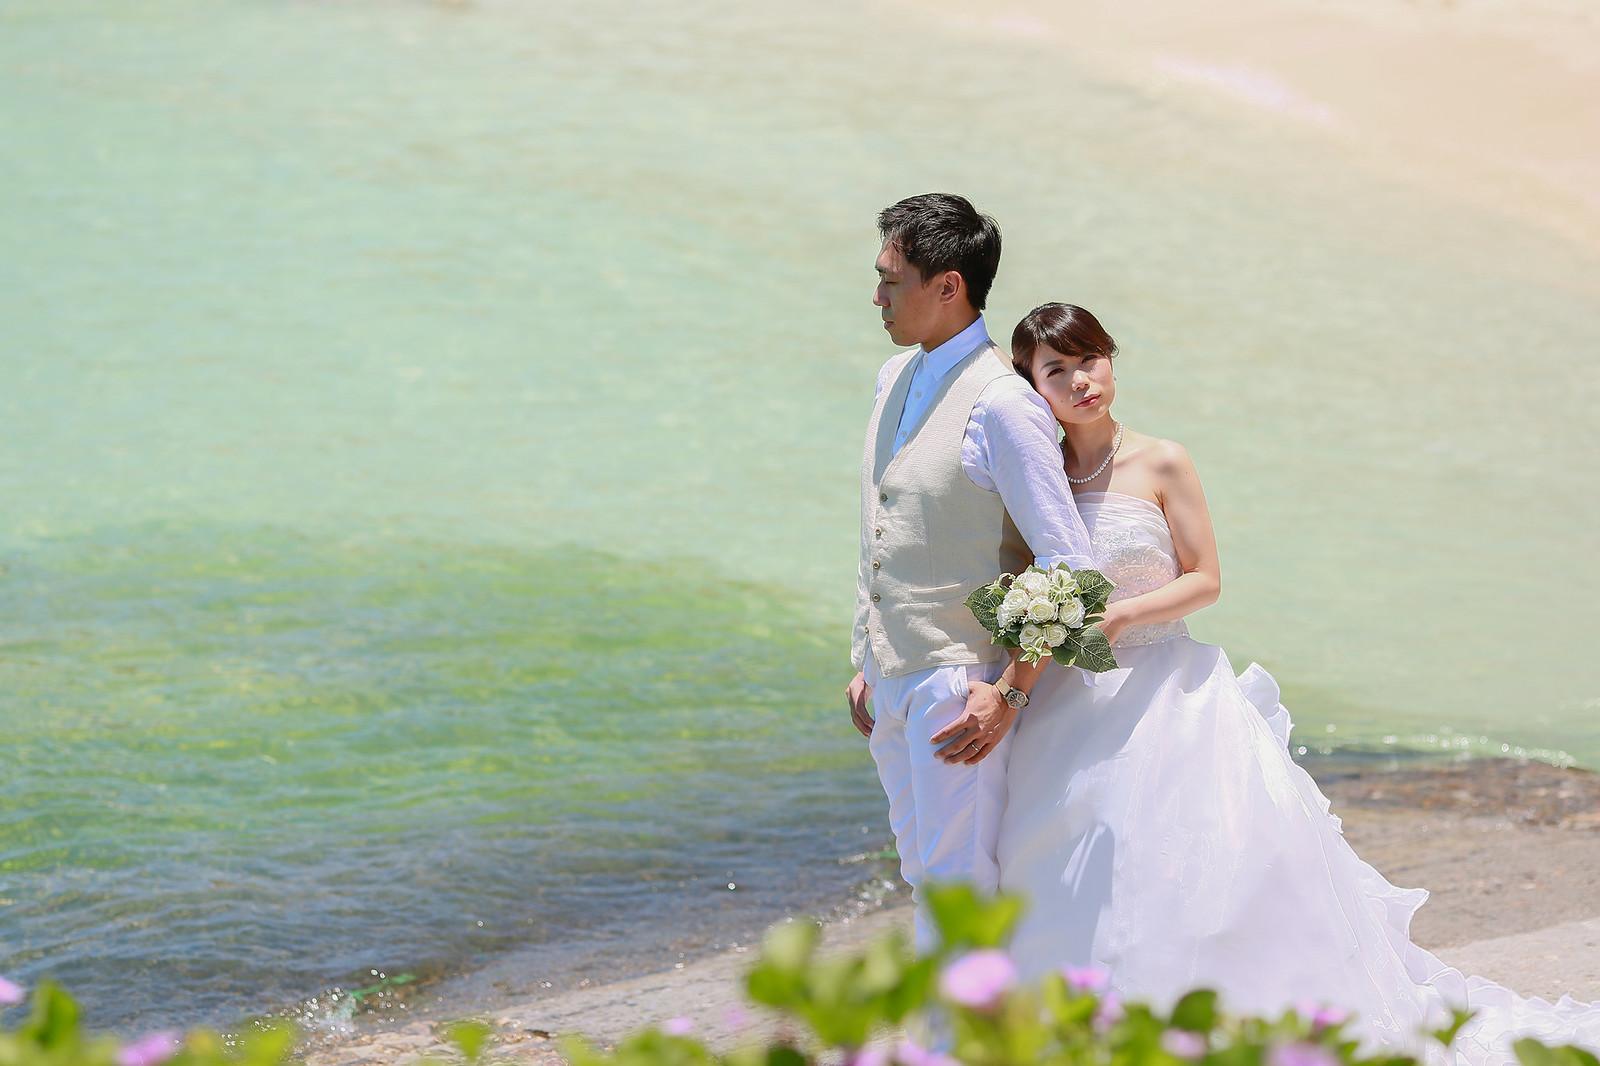 Shangri-la Mactan Cebu, Shangri-la Mactan Cebu Pre-Wedding